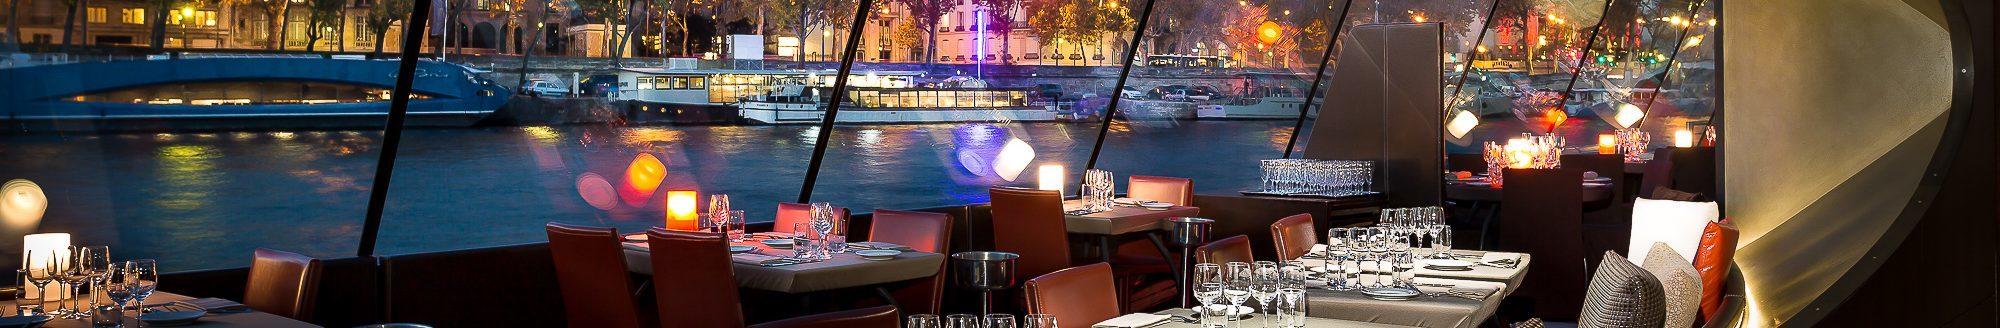 Photos Bateaux Parisiens Dinner Cruise